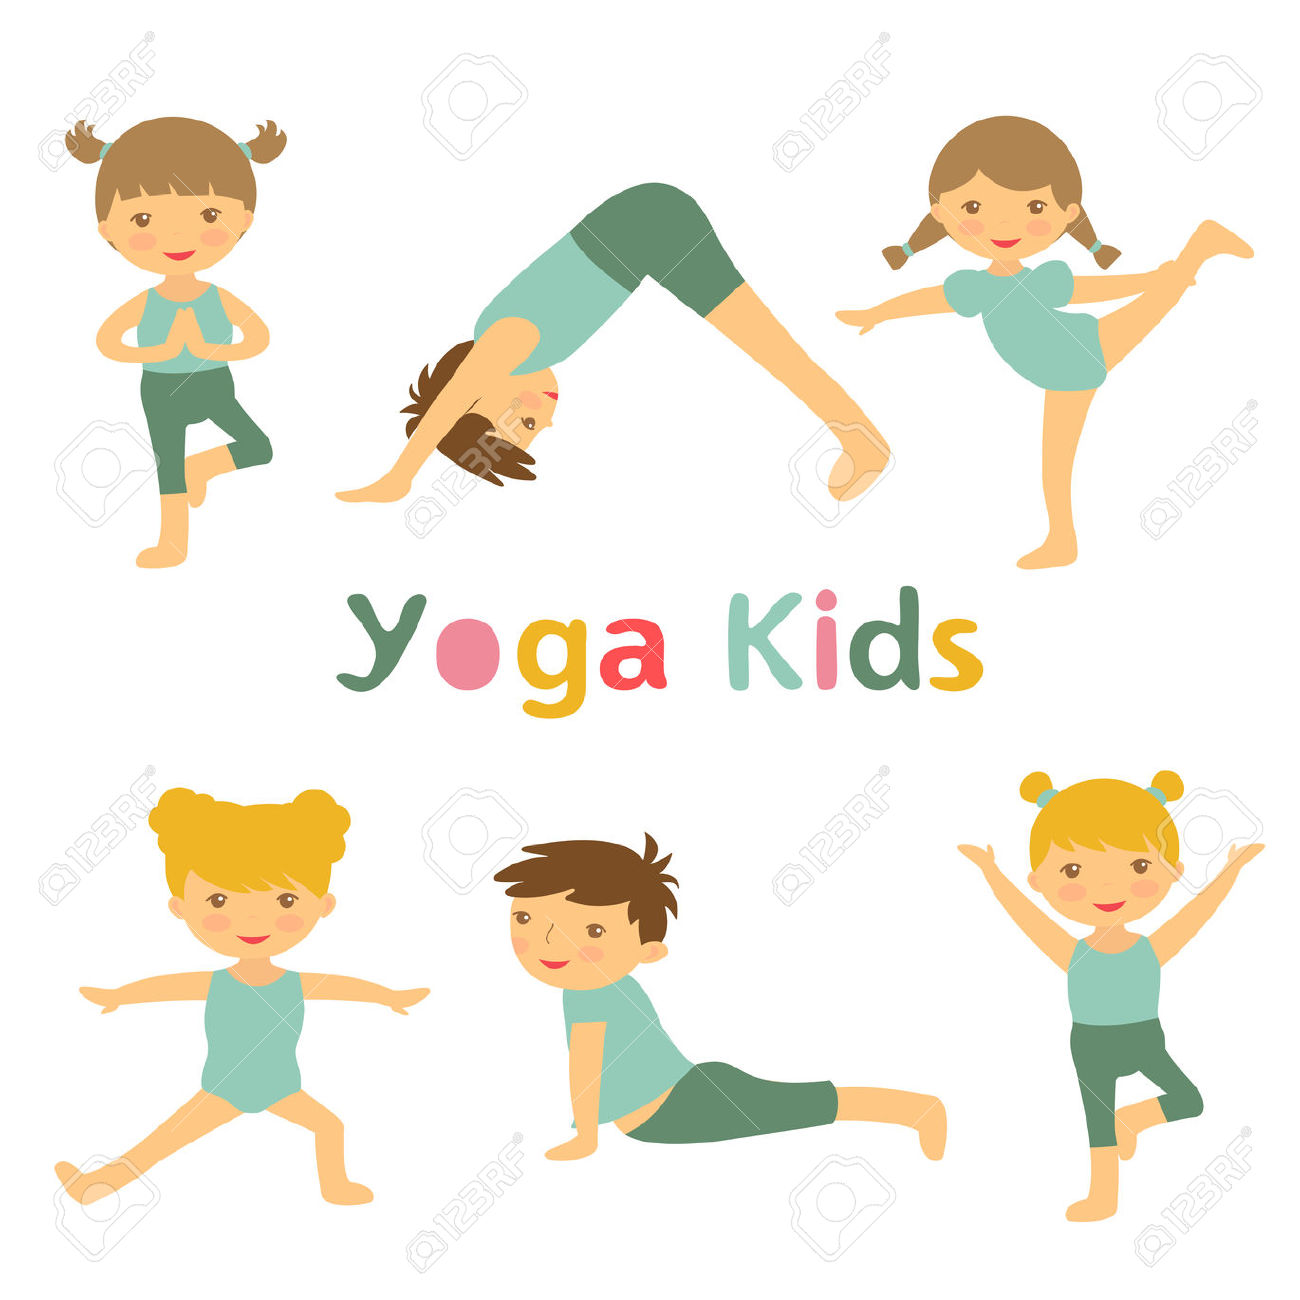 1,131 Yoga Kids Stock Vector Illustration And Royalty Free Yoga.